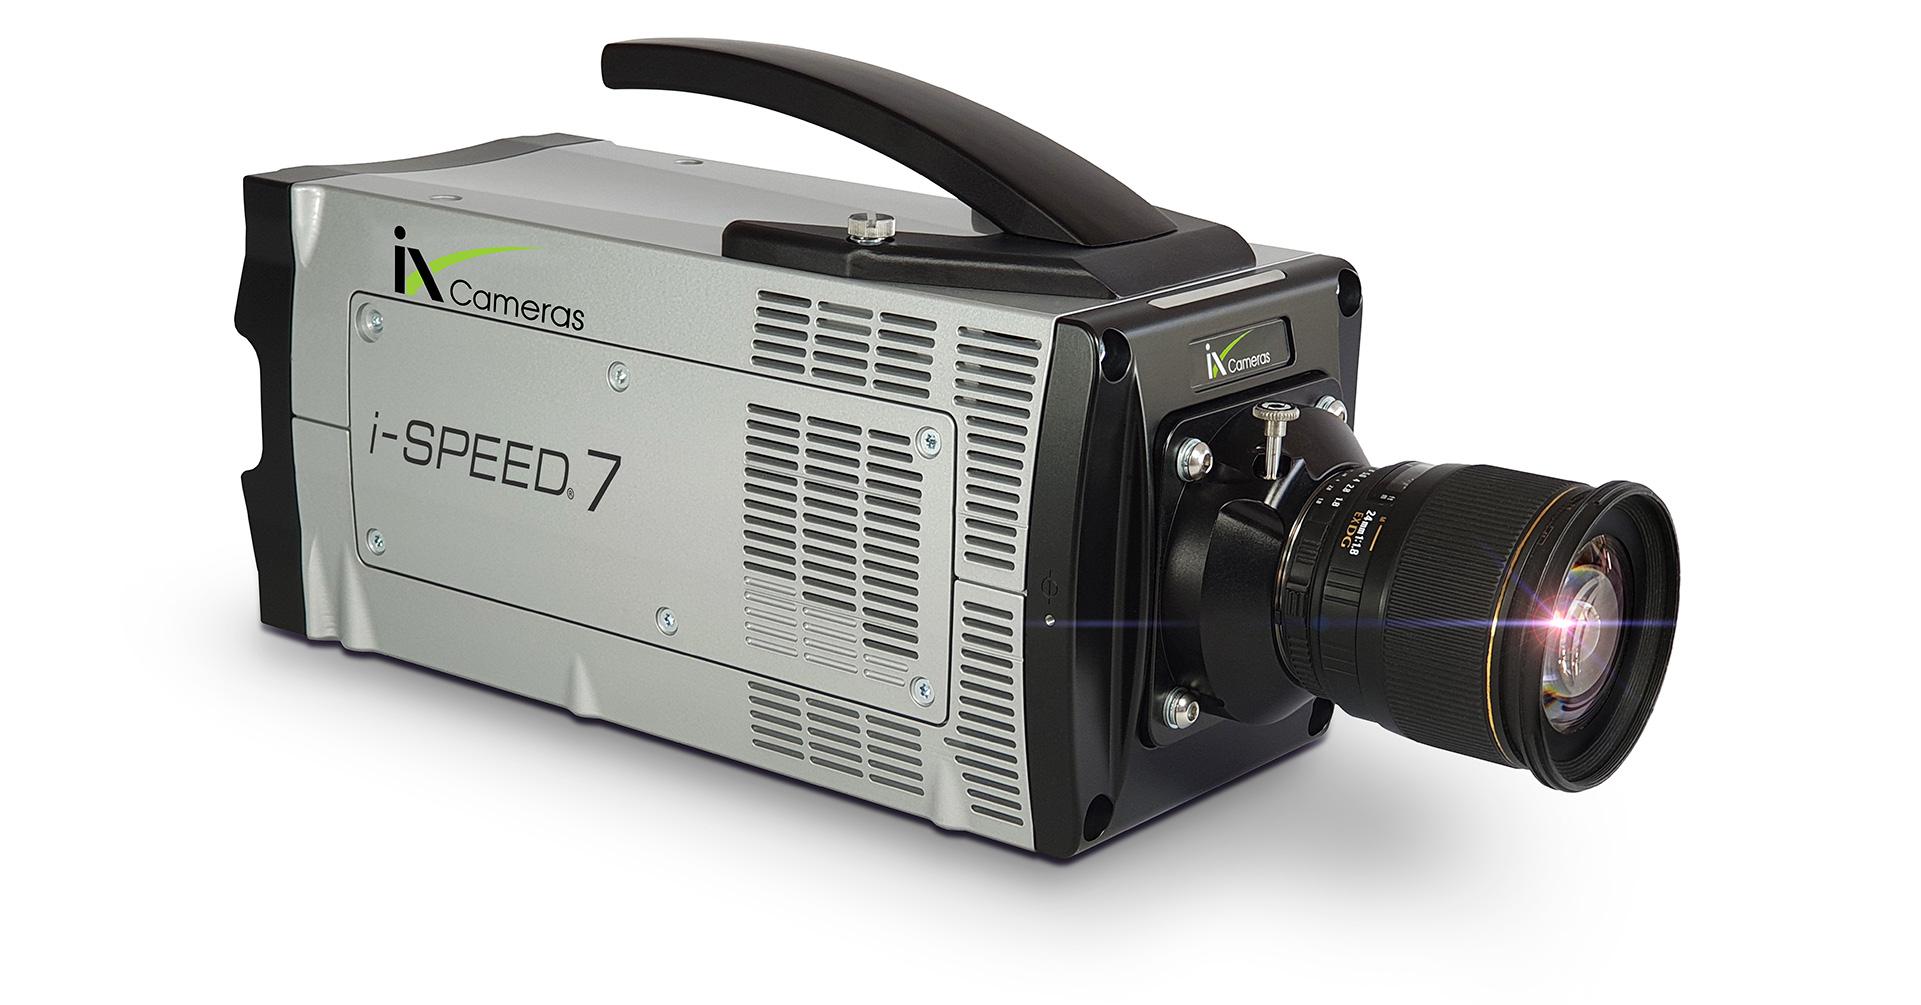 i-SPEED 7 Series Next Generation ultra high-speed video camera.